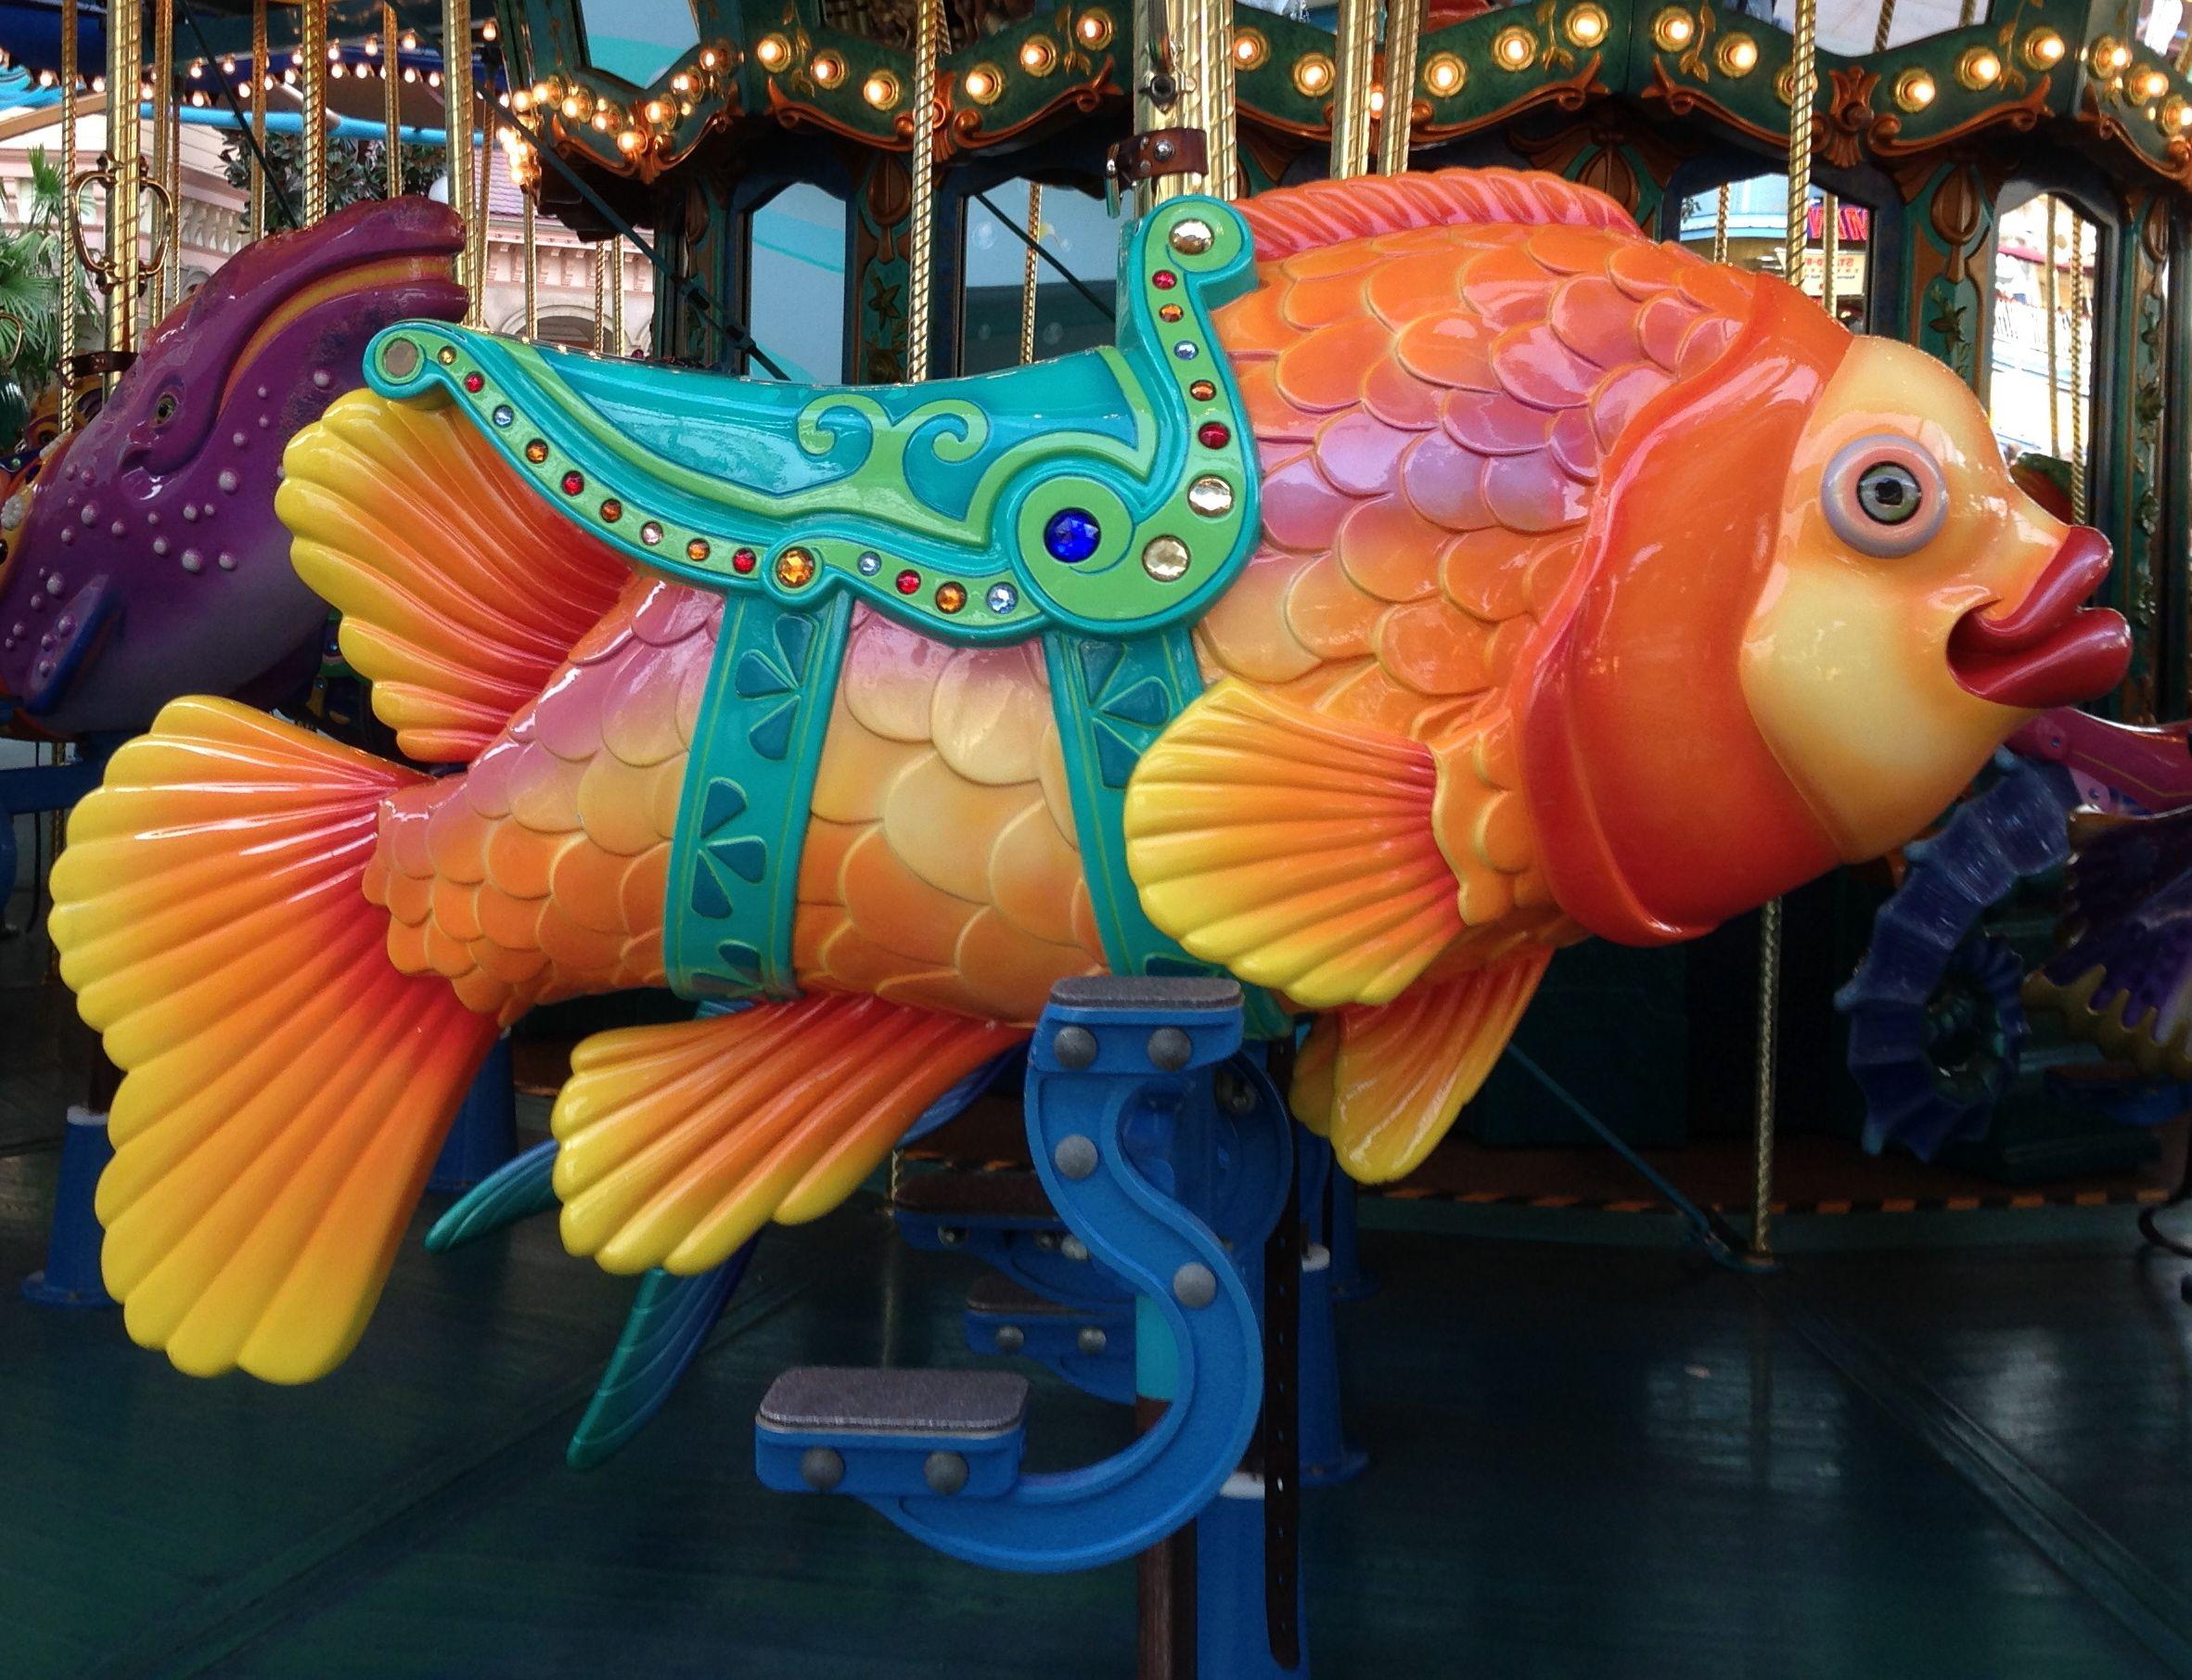 National carousel association denver zoo carousel african wild dog - Disney S California Adventure King Triton S Carousel Fish